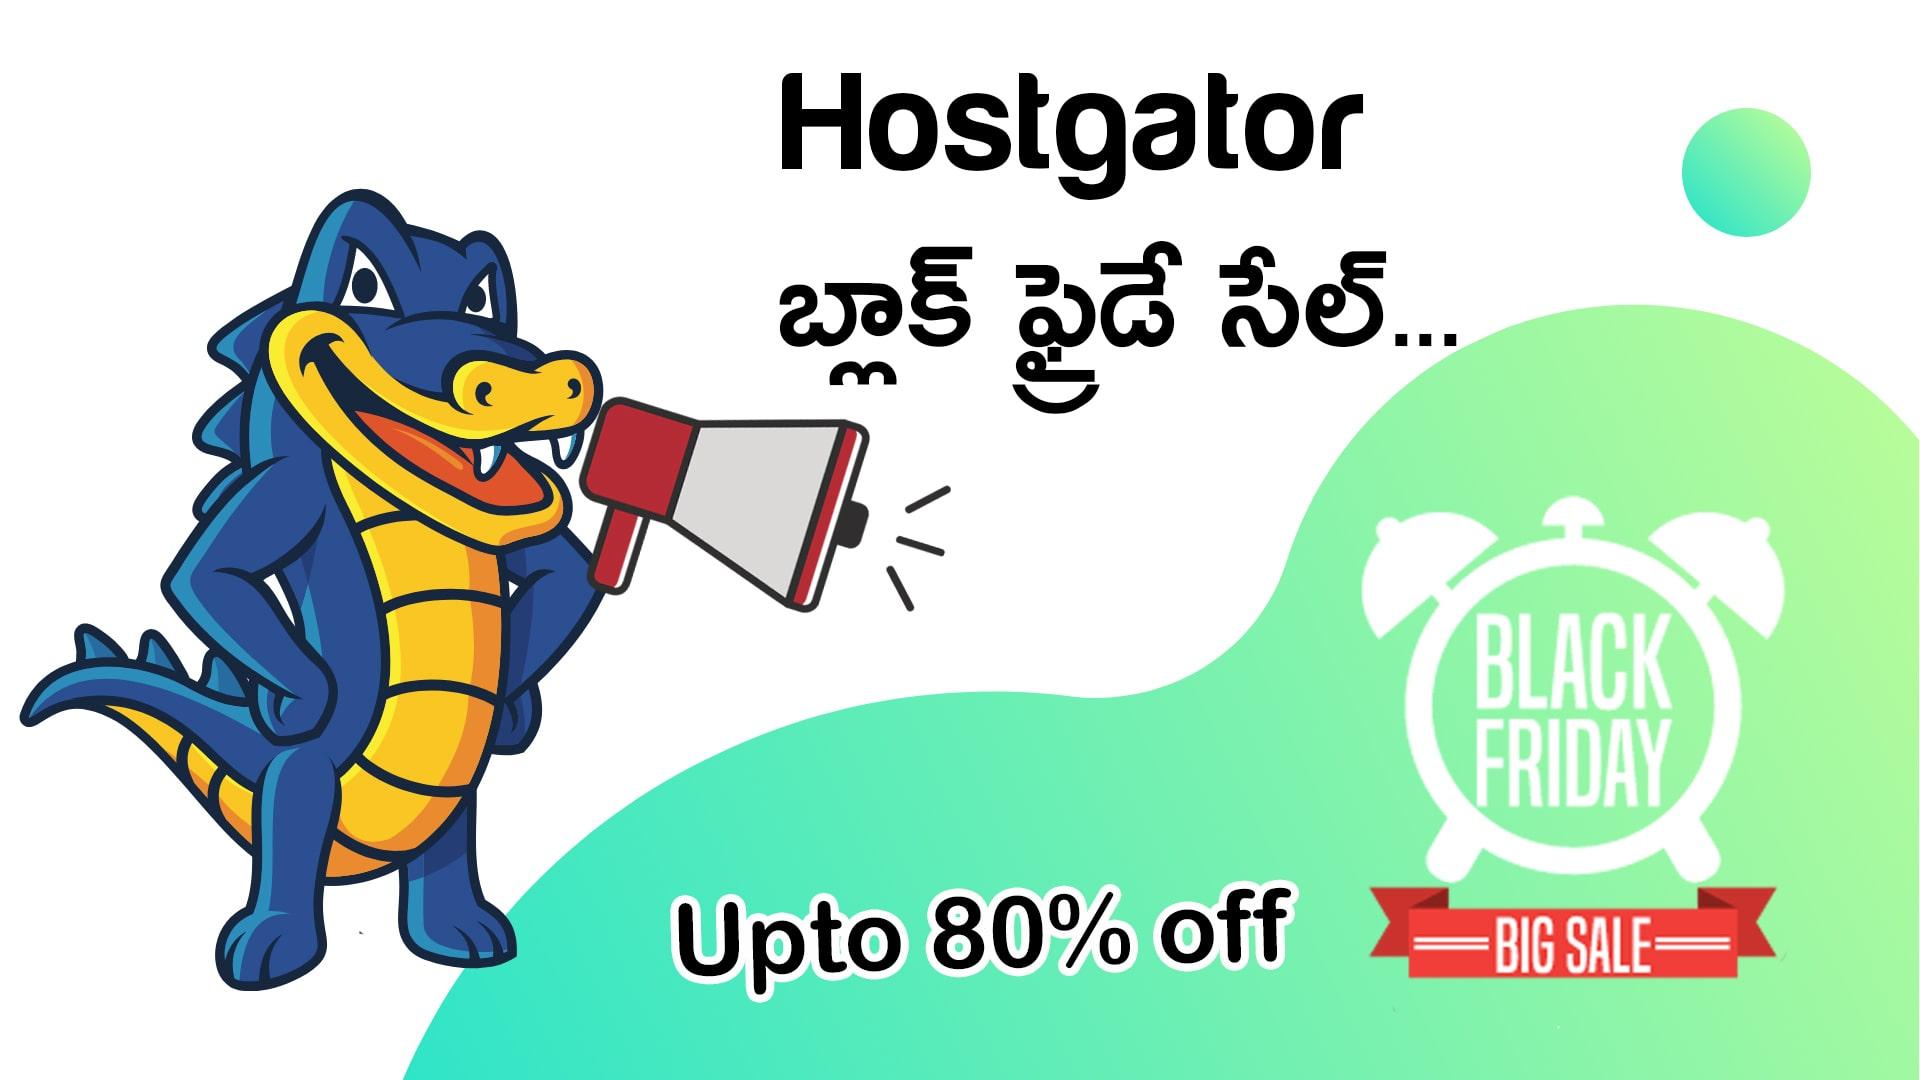 hostgator black friday deals in telugu